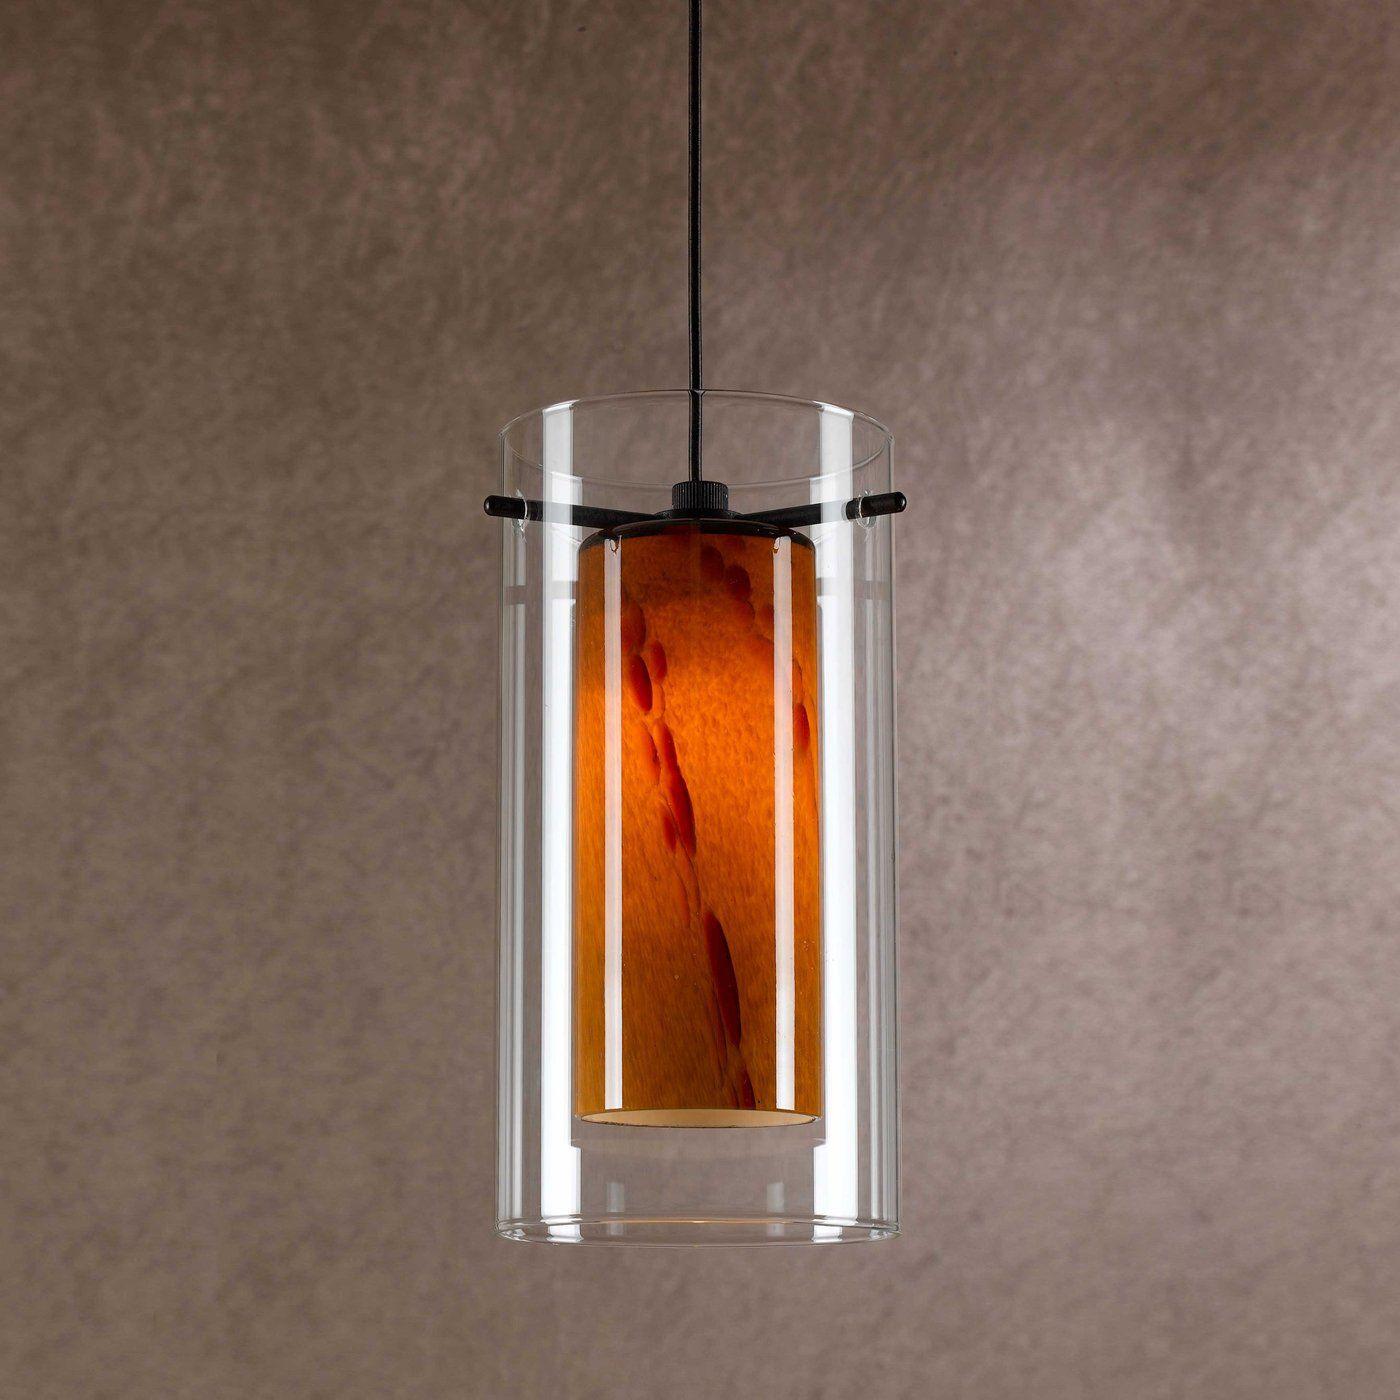 Delightful Cal Lighting PNL 1053/6 RU Low Voltage Mini Pendant Good Ideas